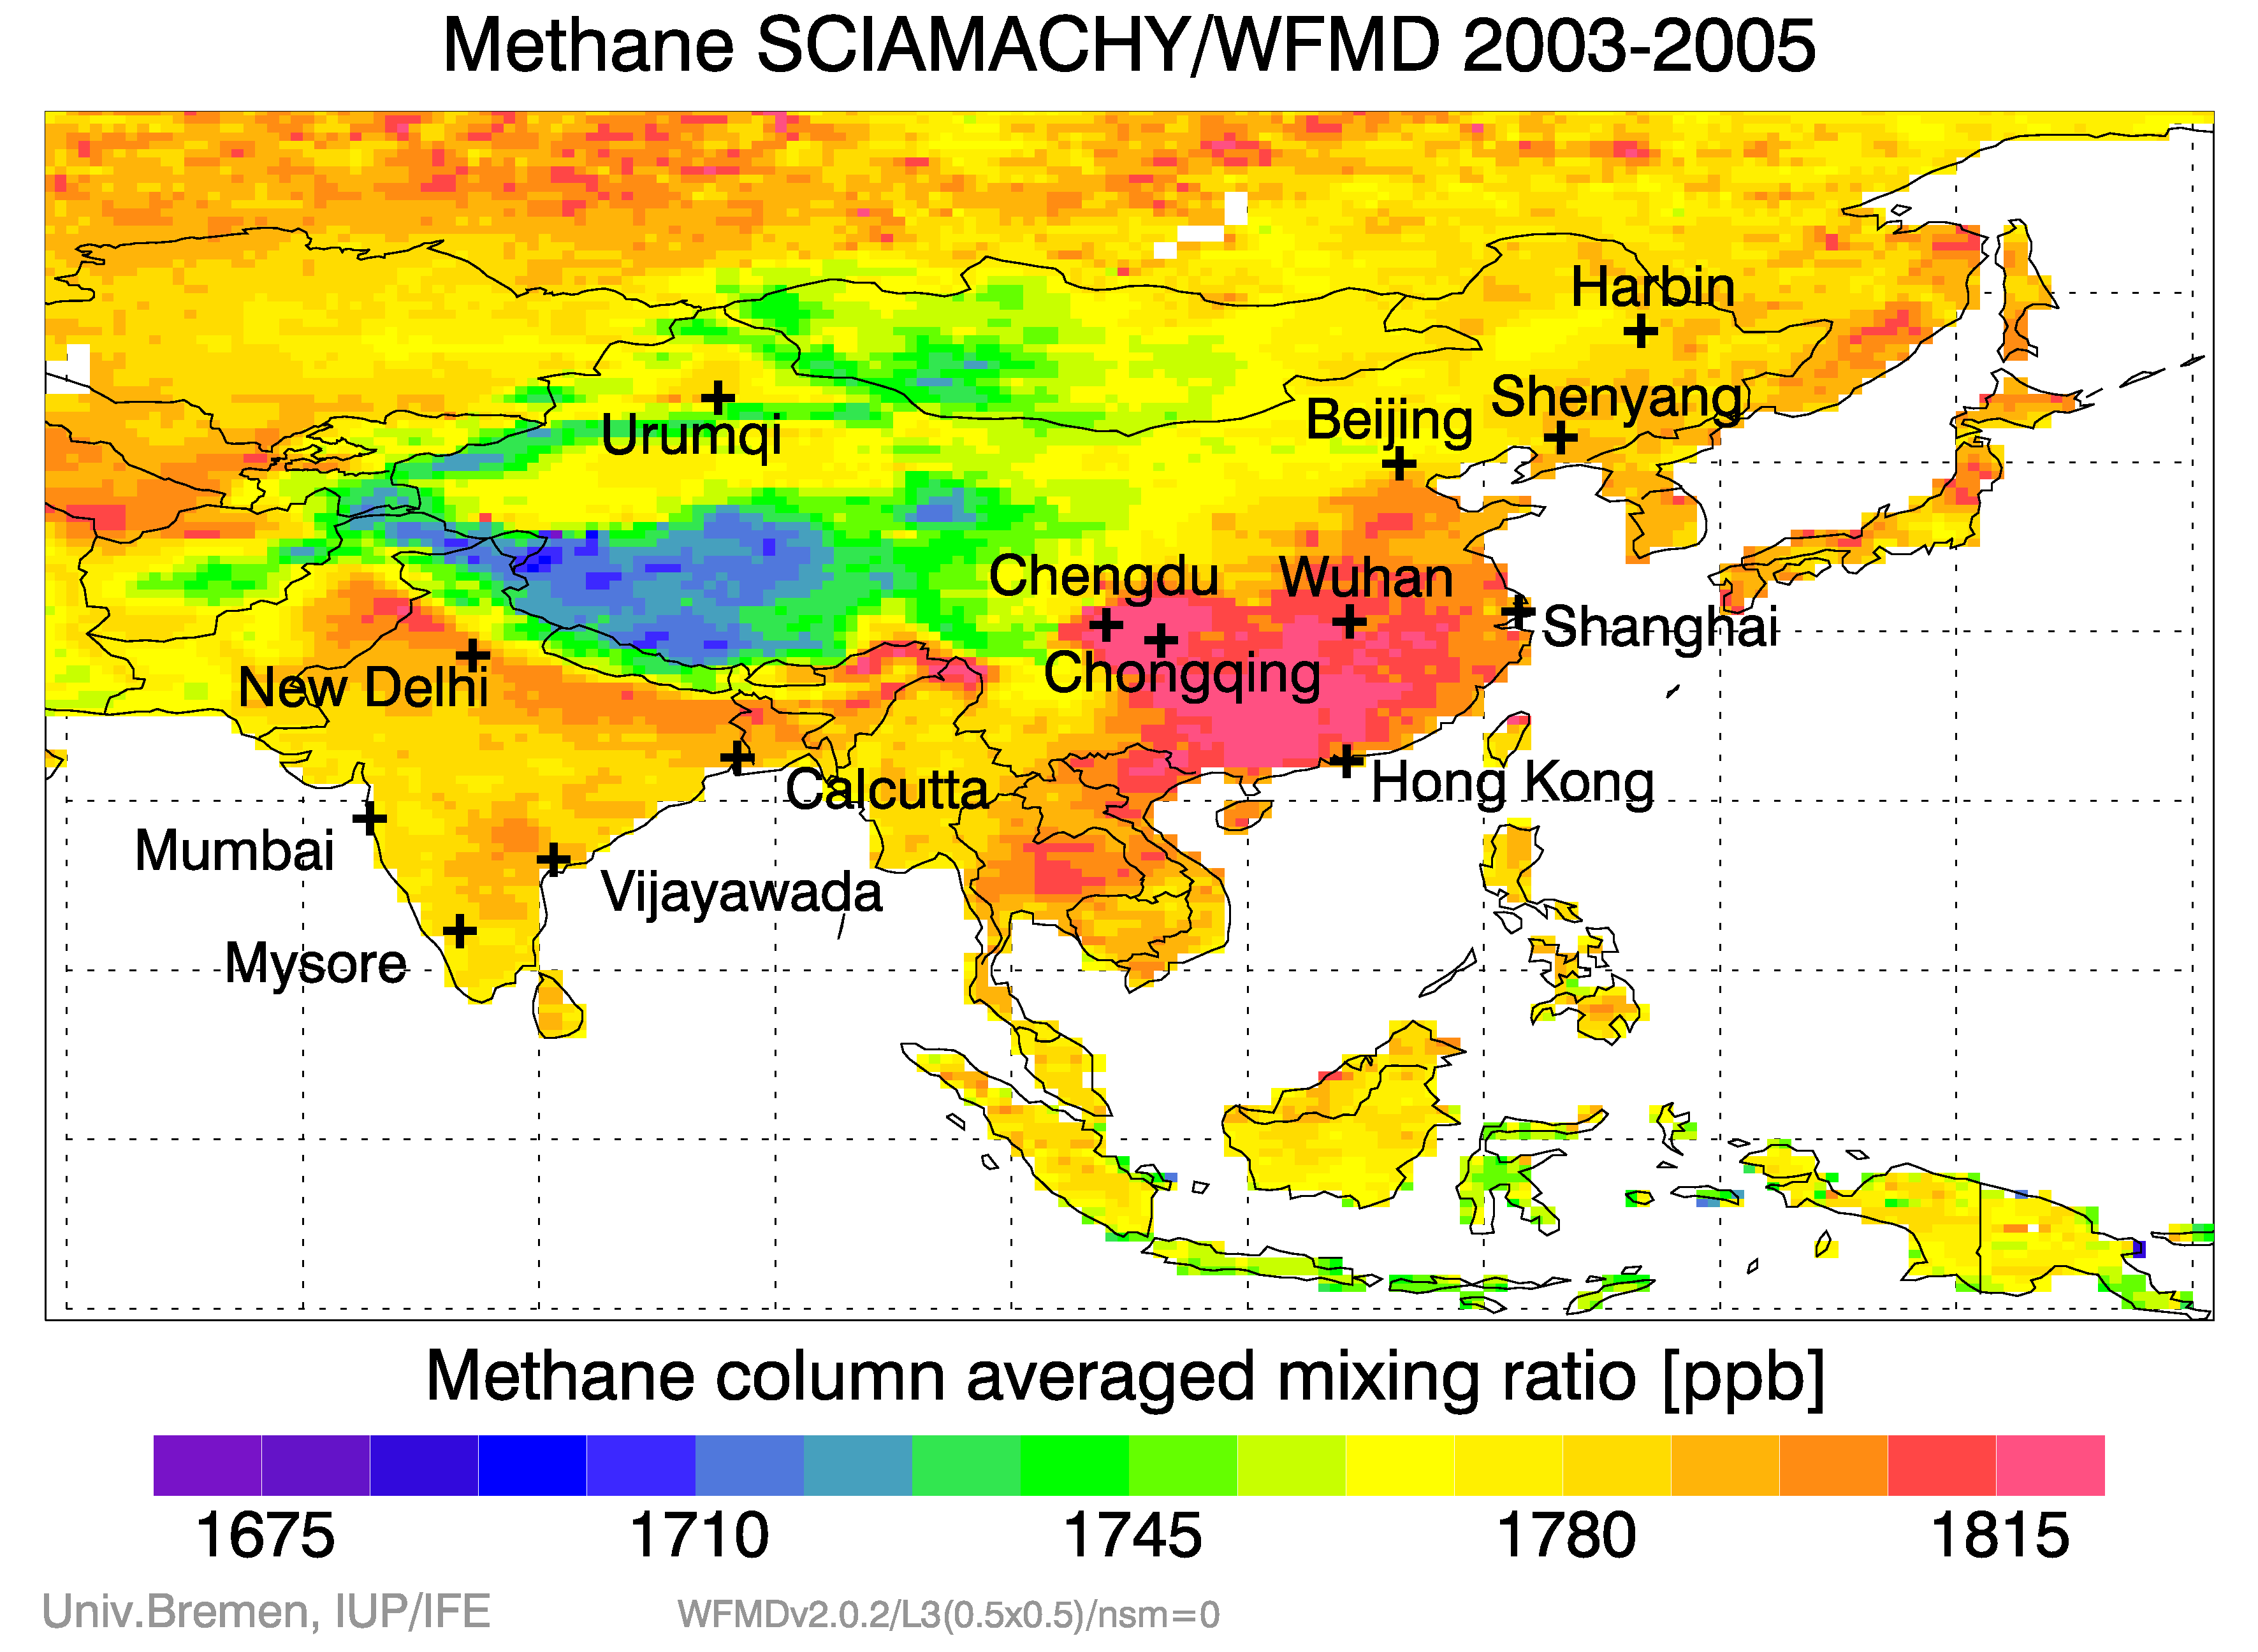 scia_methane_wfmd_china_gimp